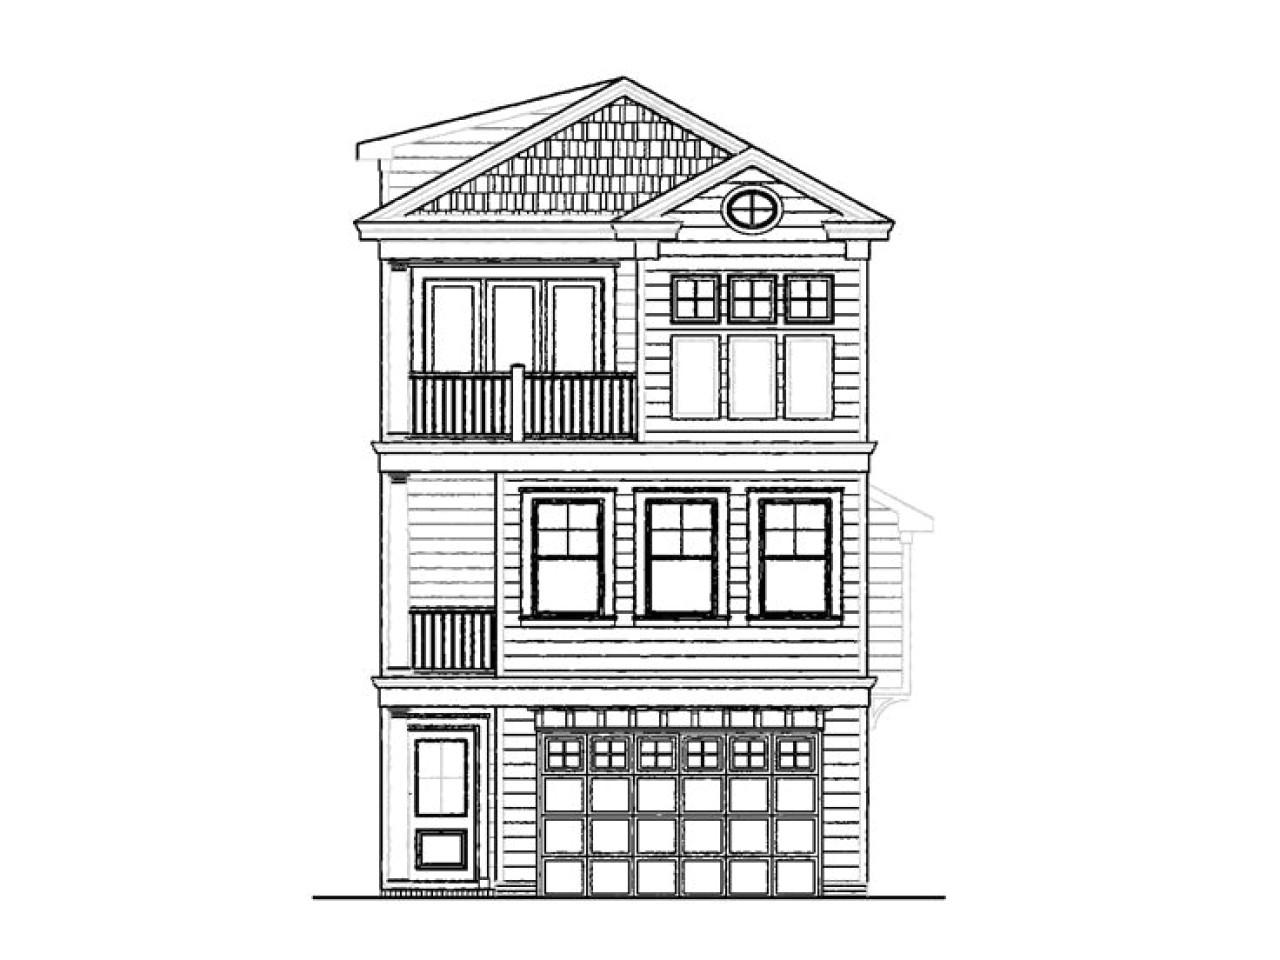 fe126b845bea27c3 narrow lot cottage house plans 3 story narrow lot house plans for beach